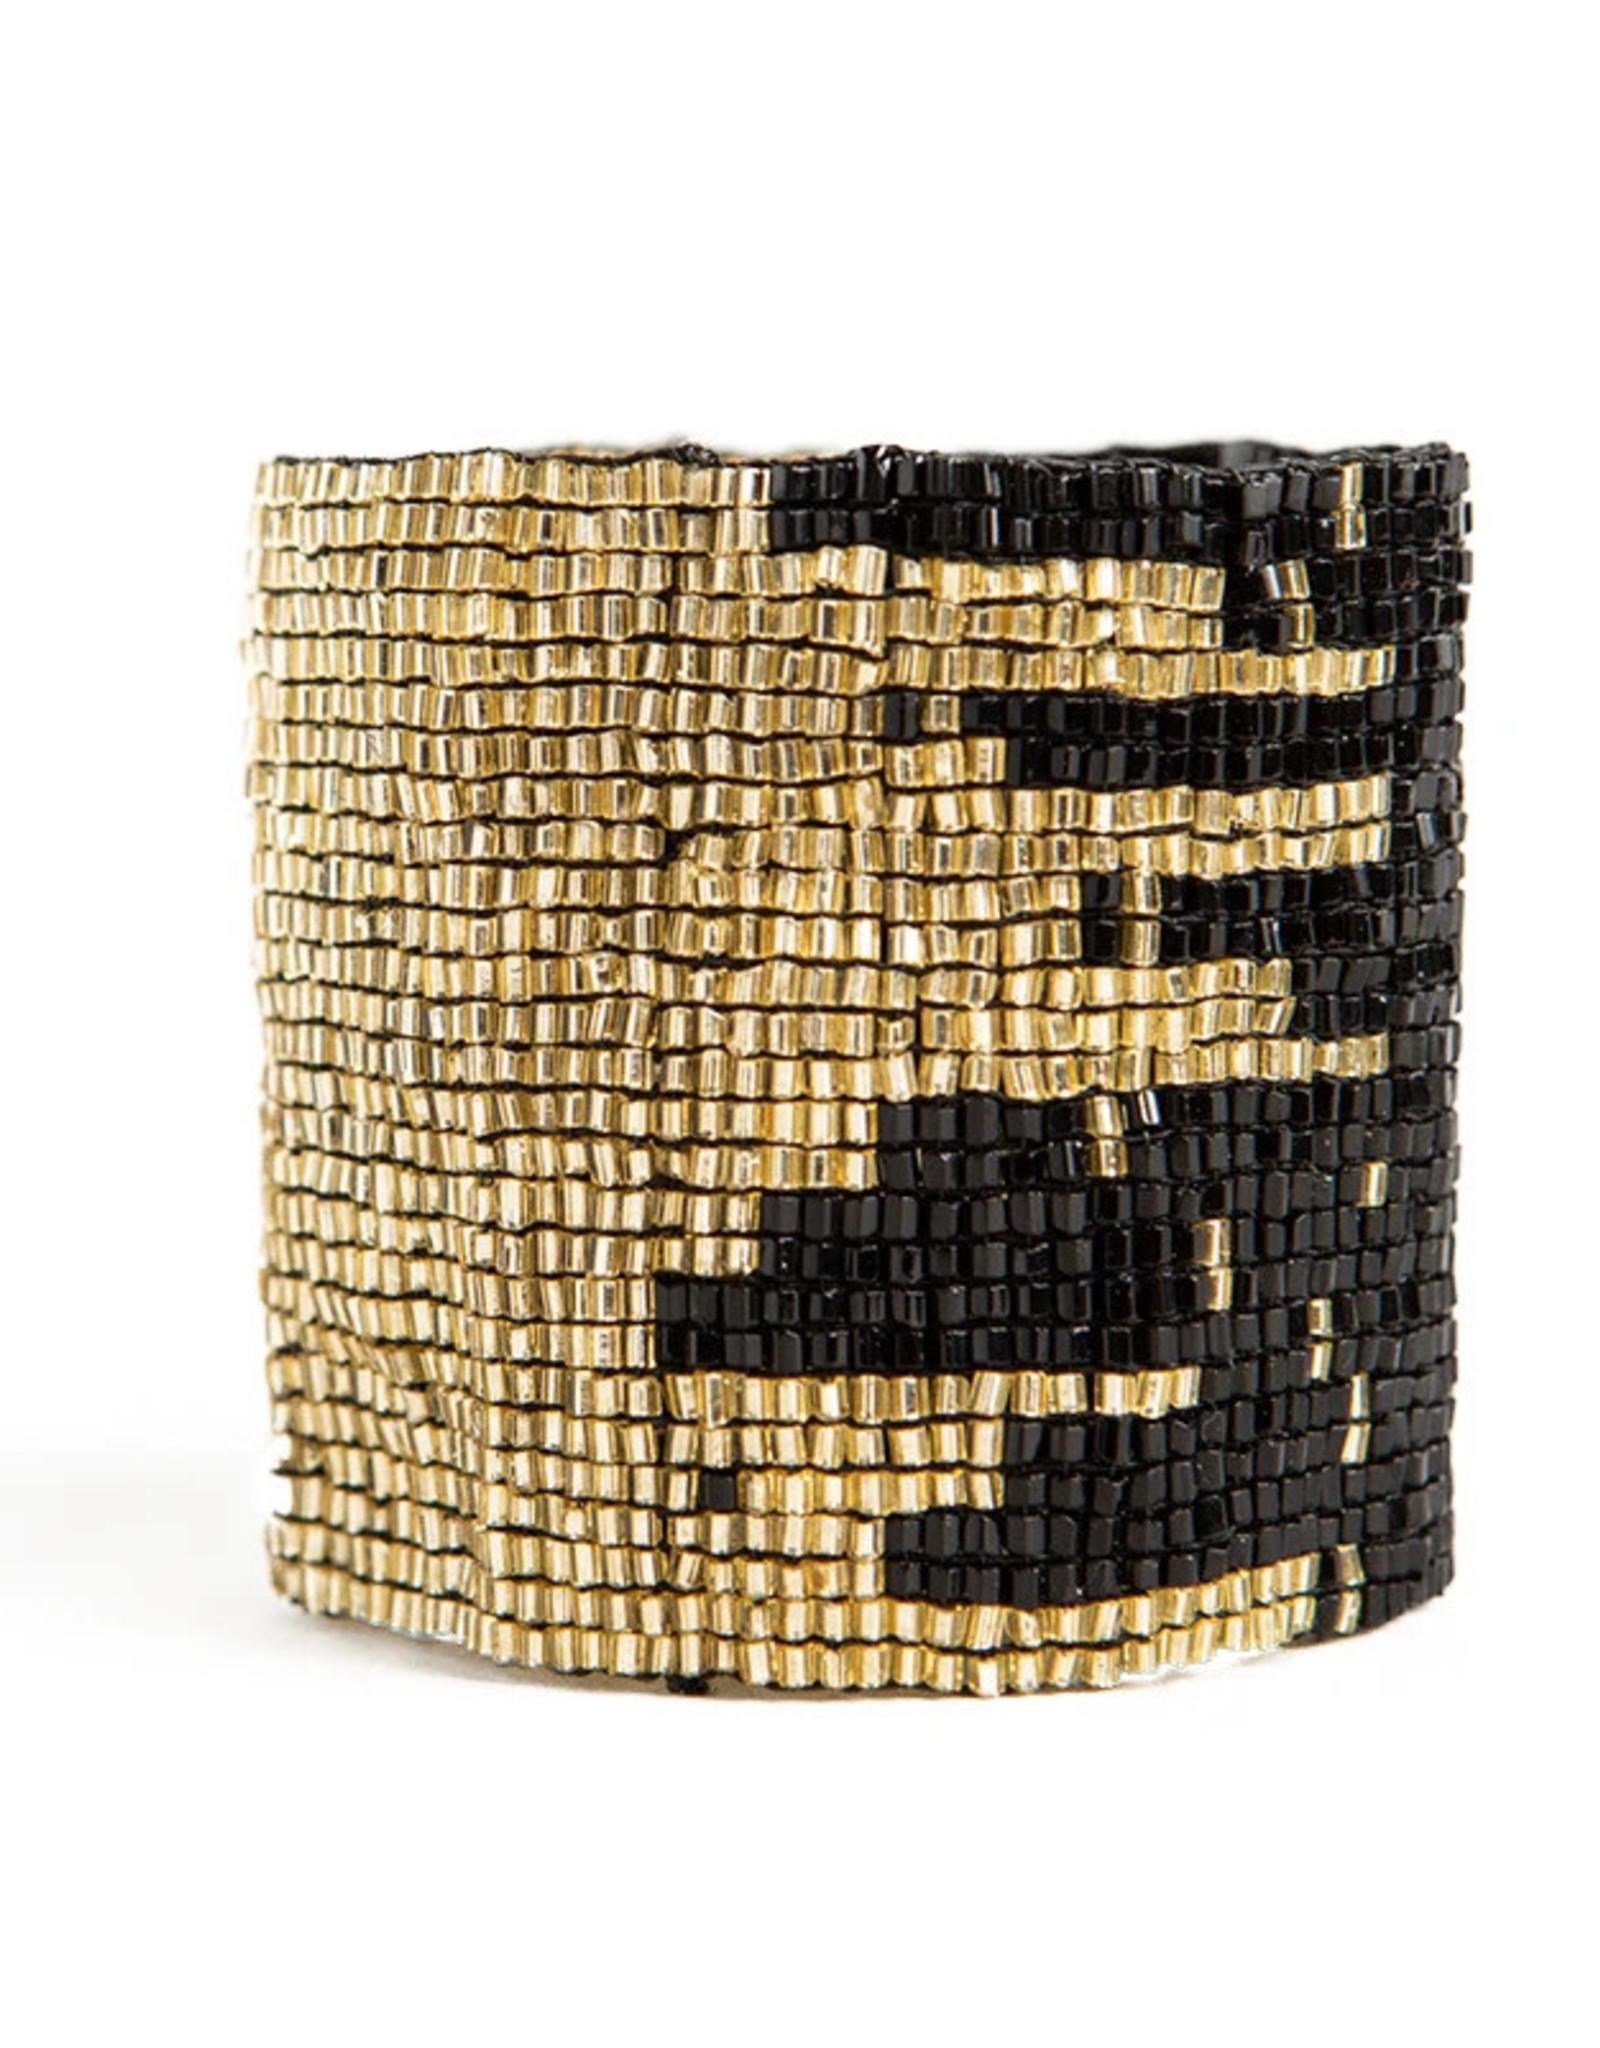 BRACELET BLACK AND GOLD STRETCH